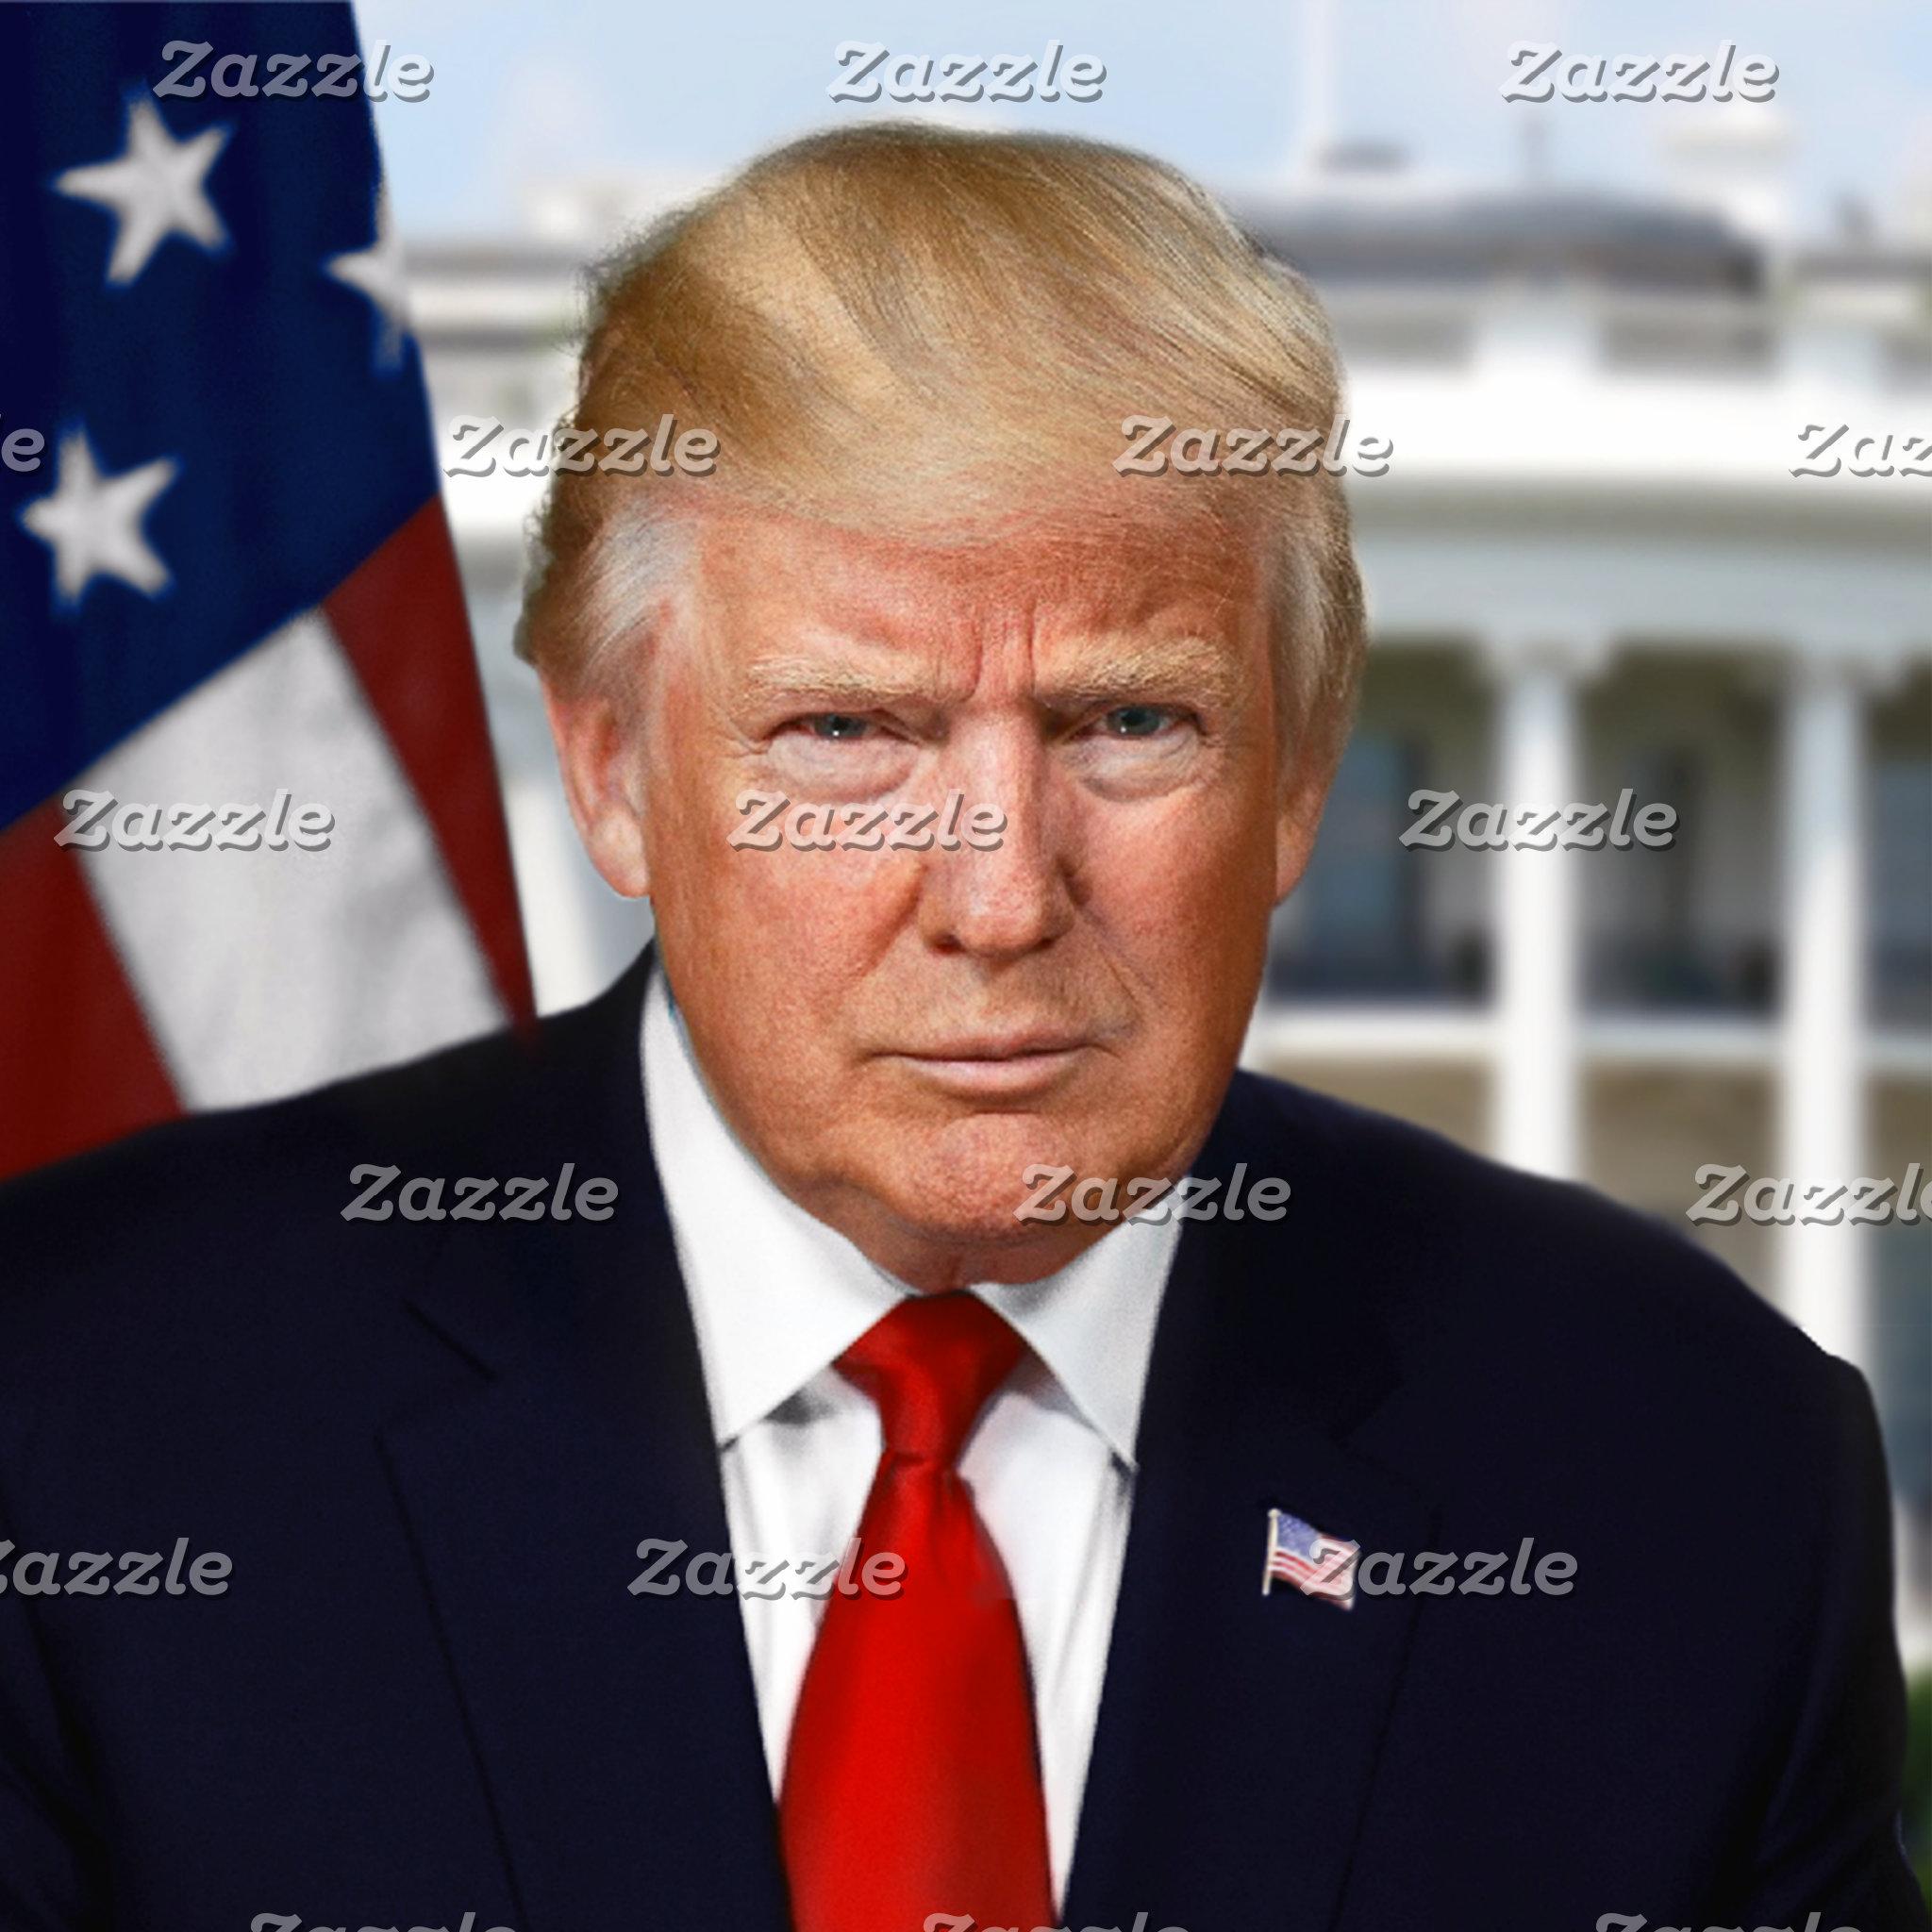 Donald Trump Portraiture